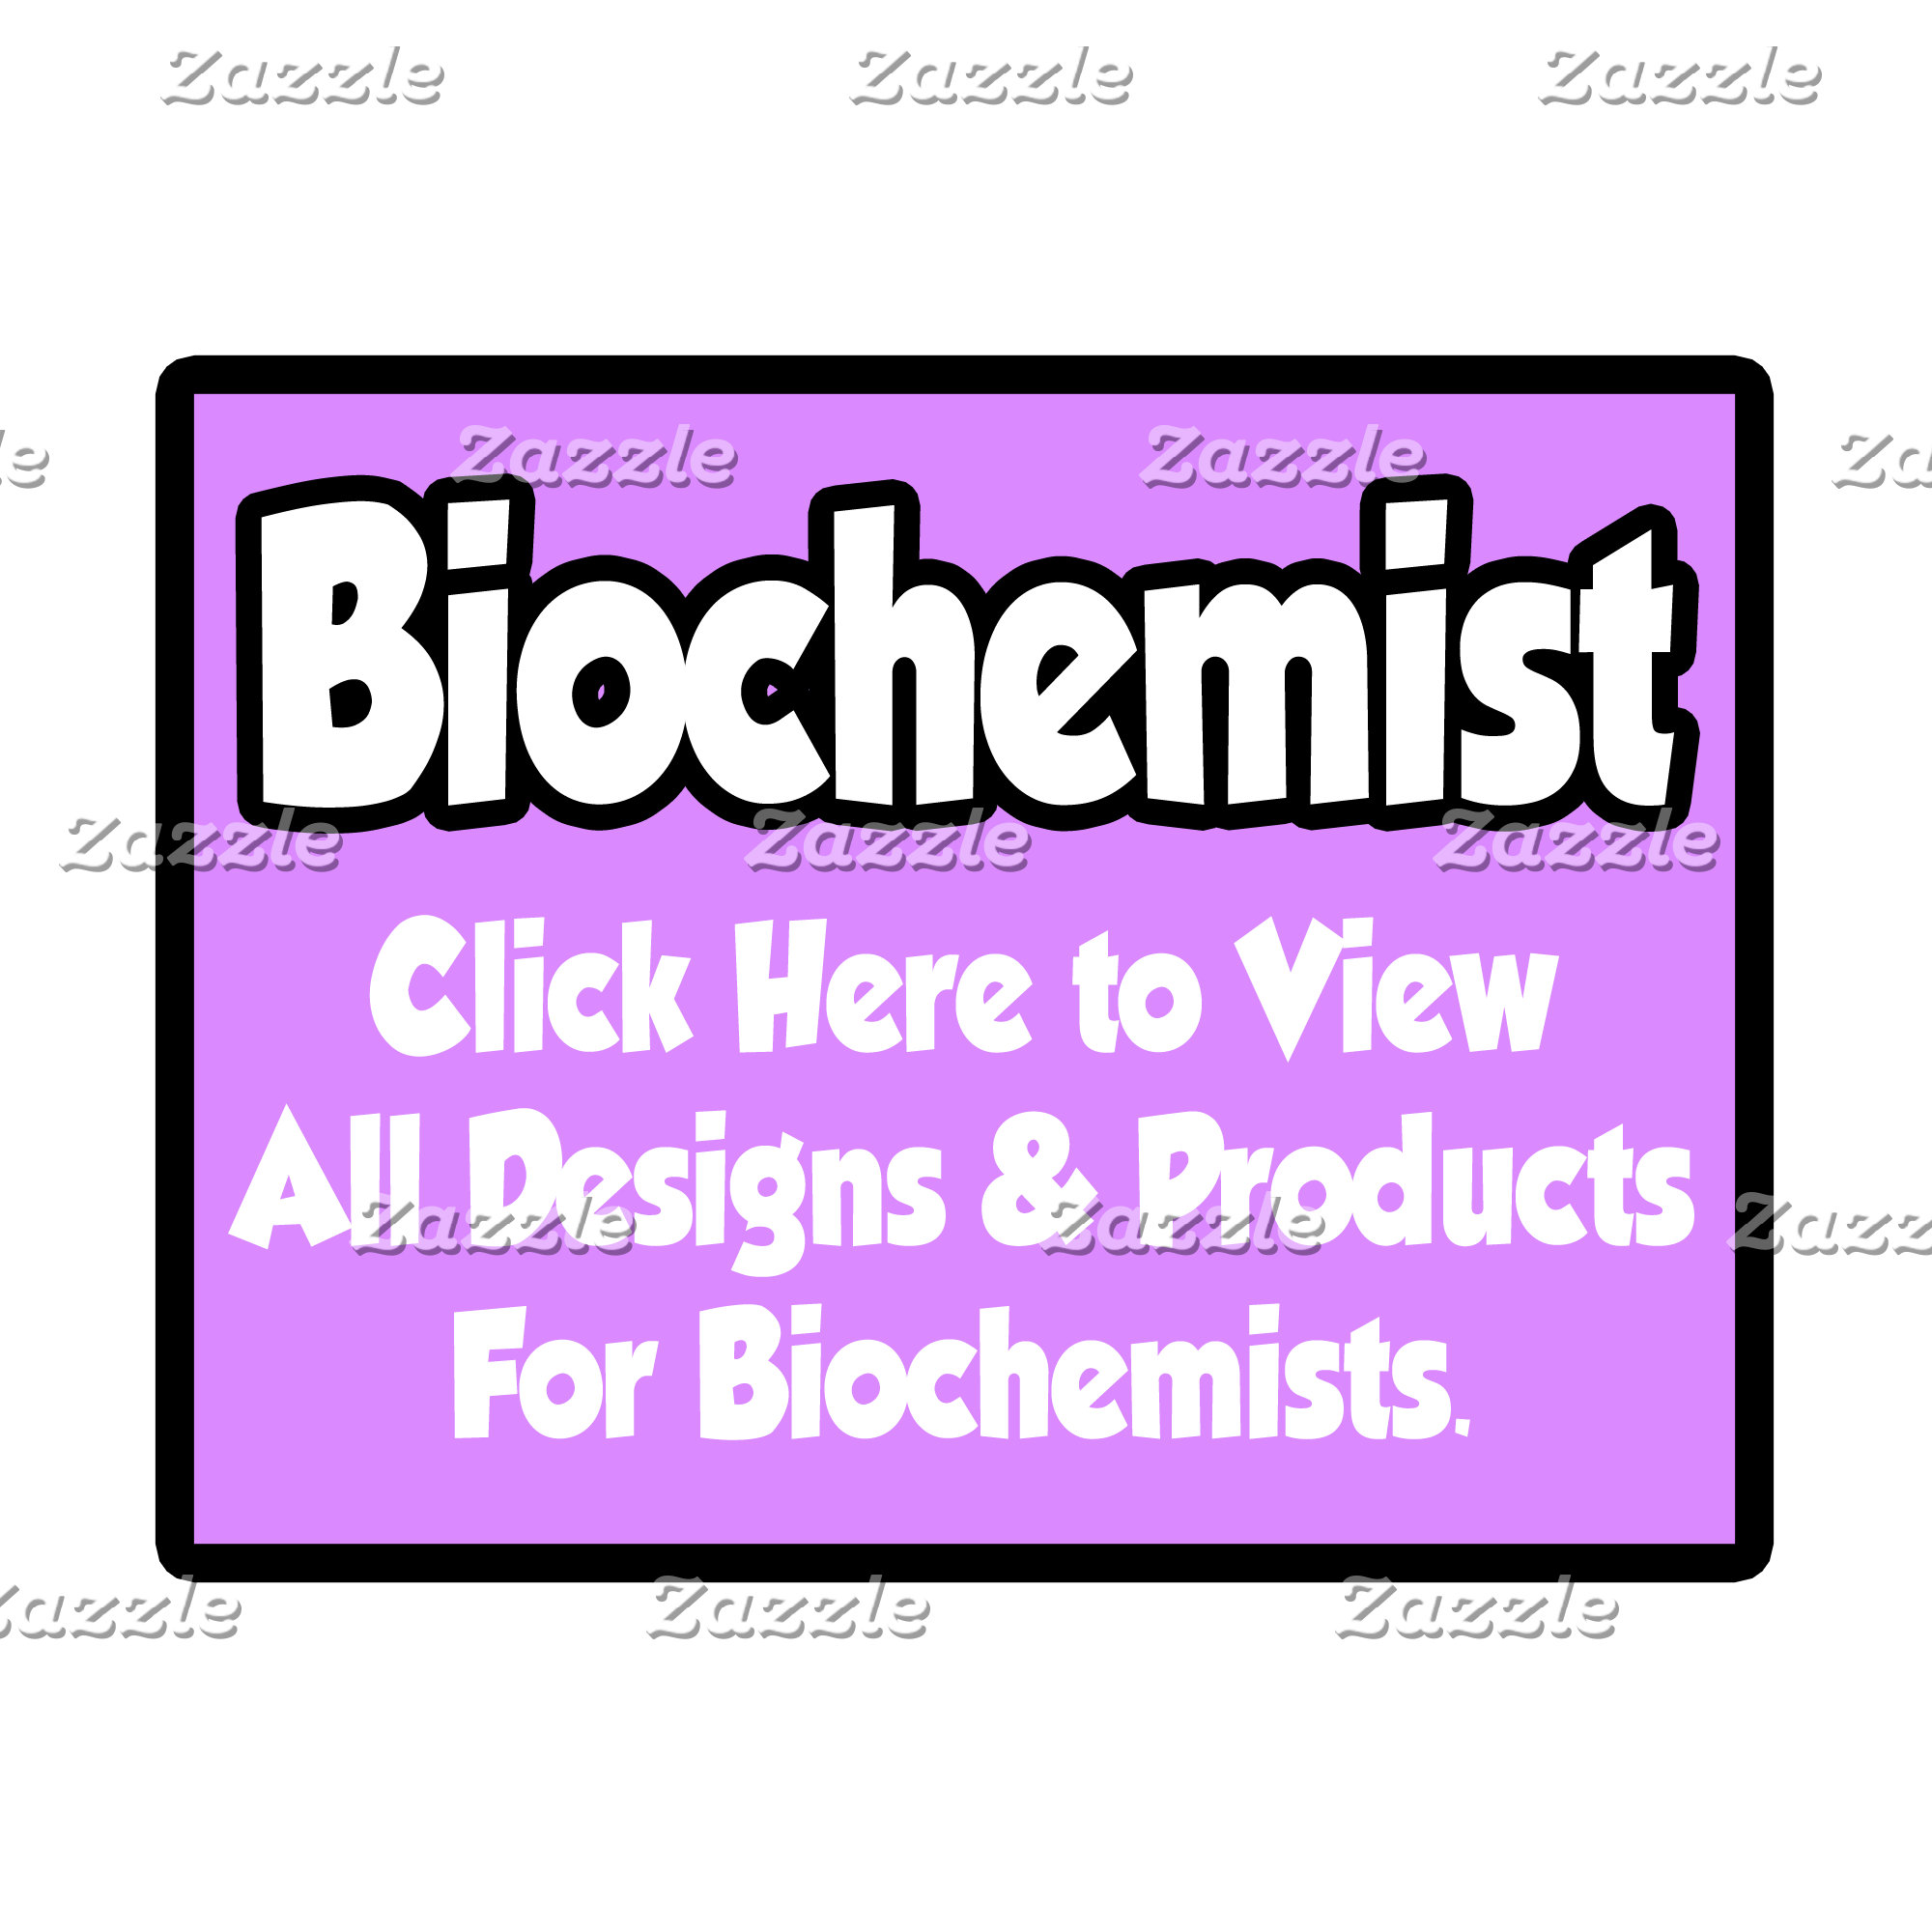 Biochemist Shirts, Gifts and Apparel